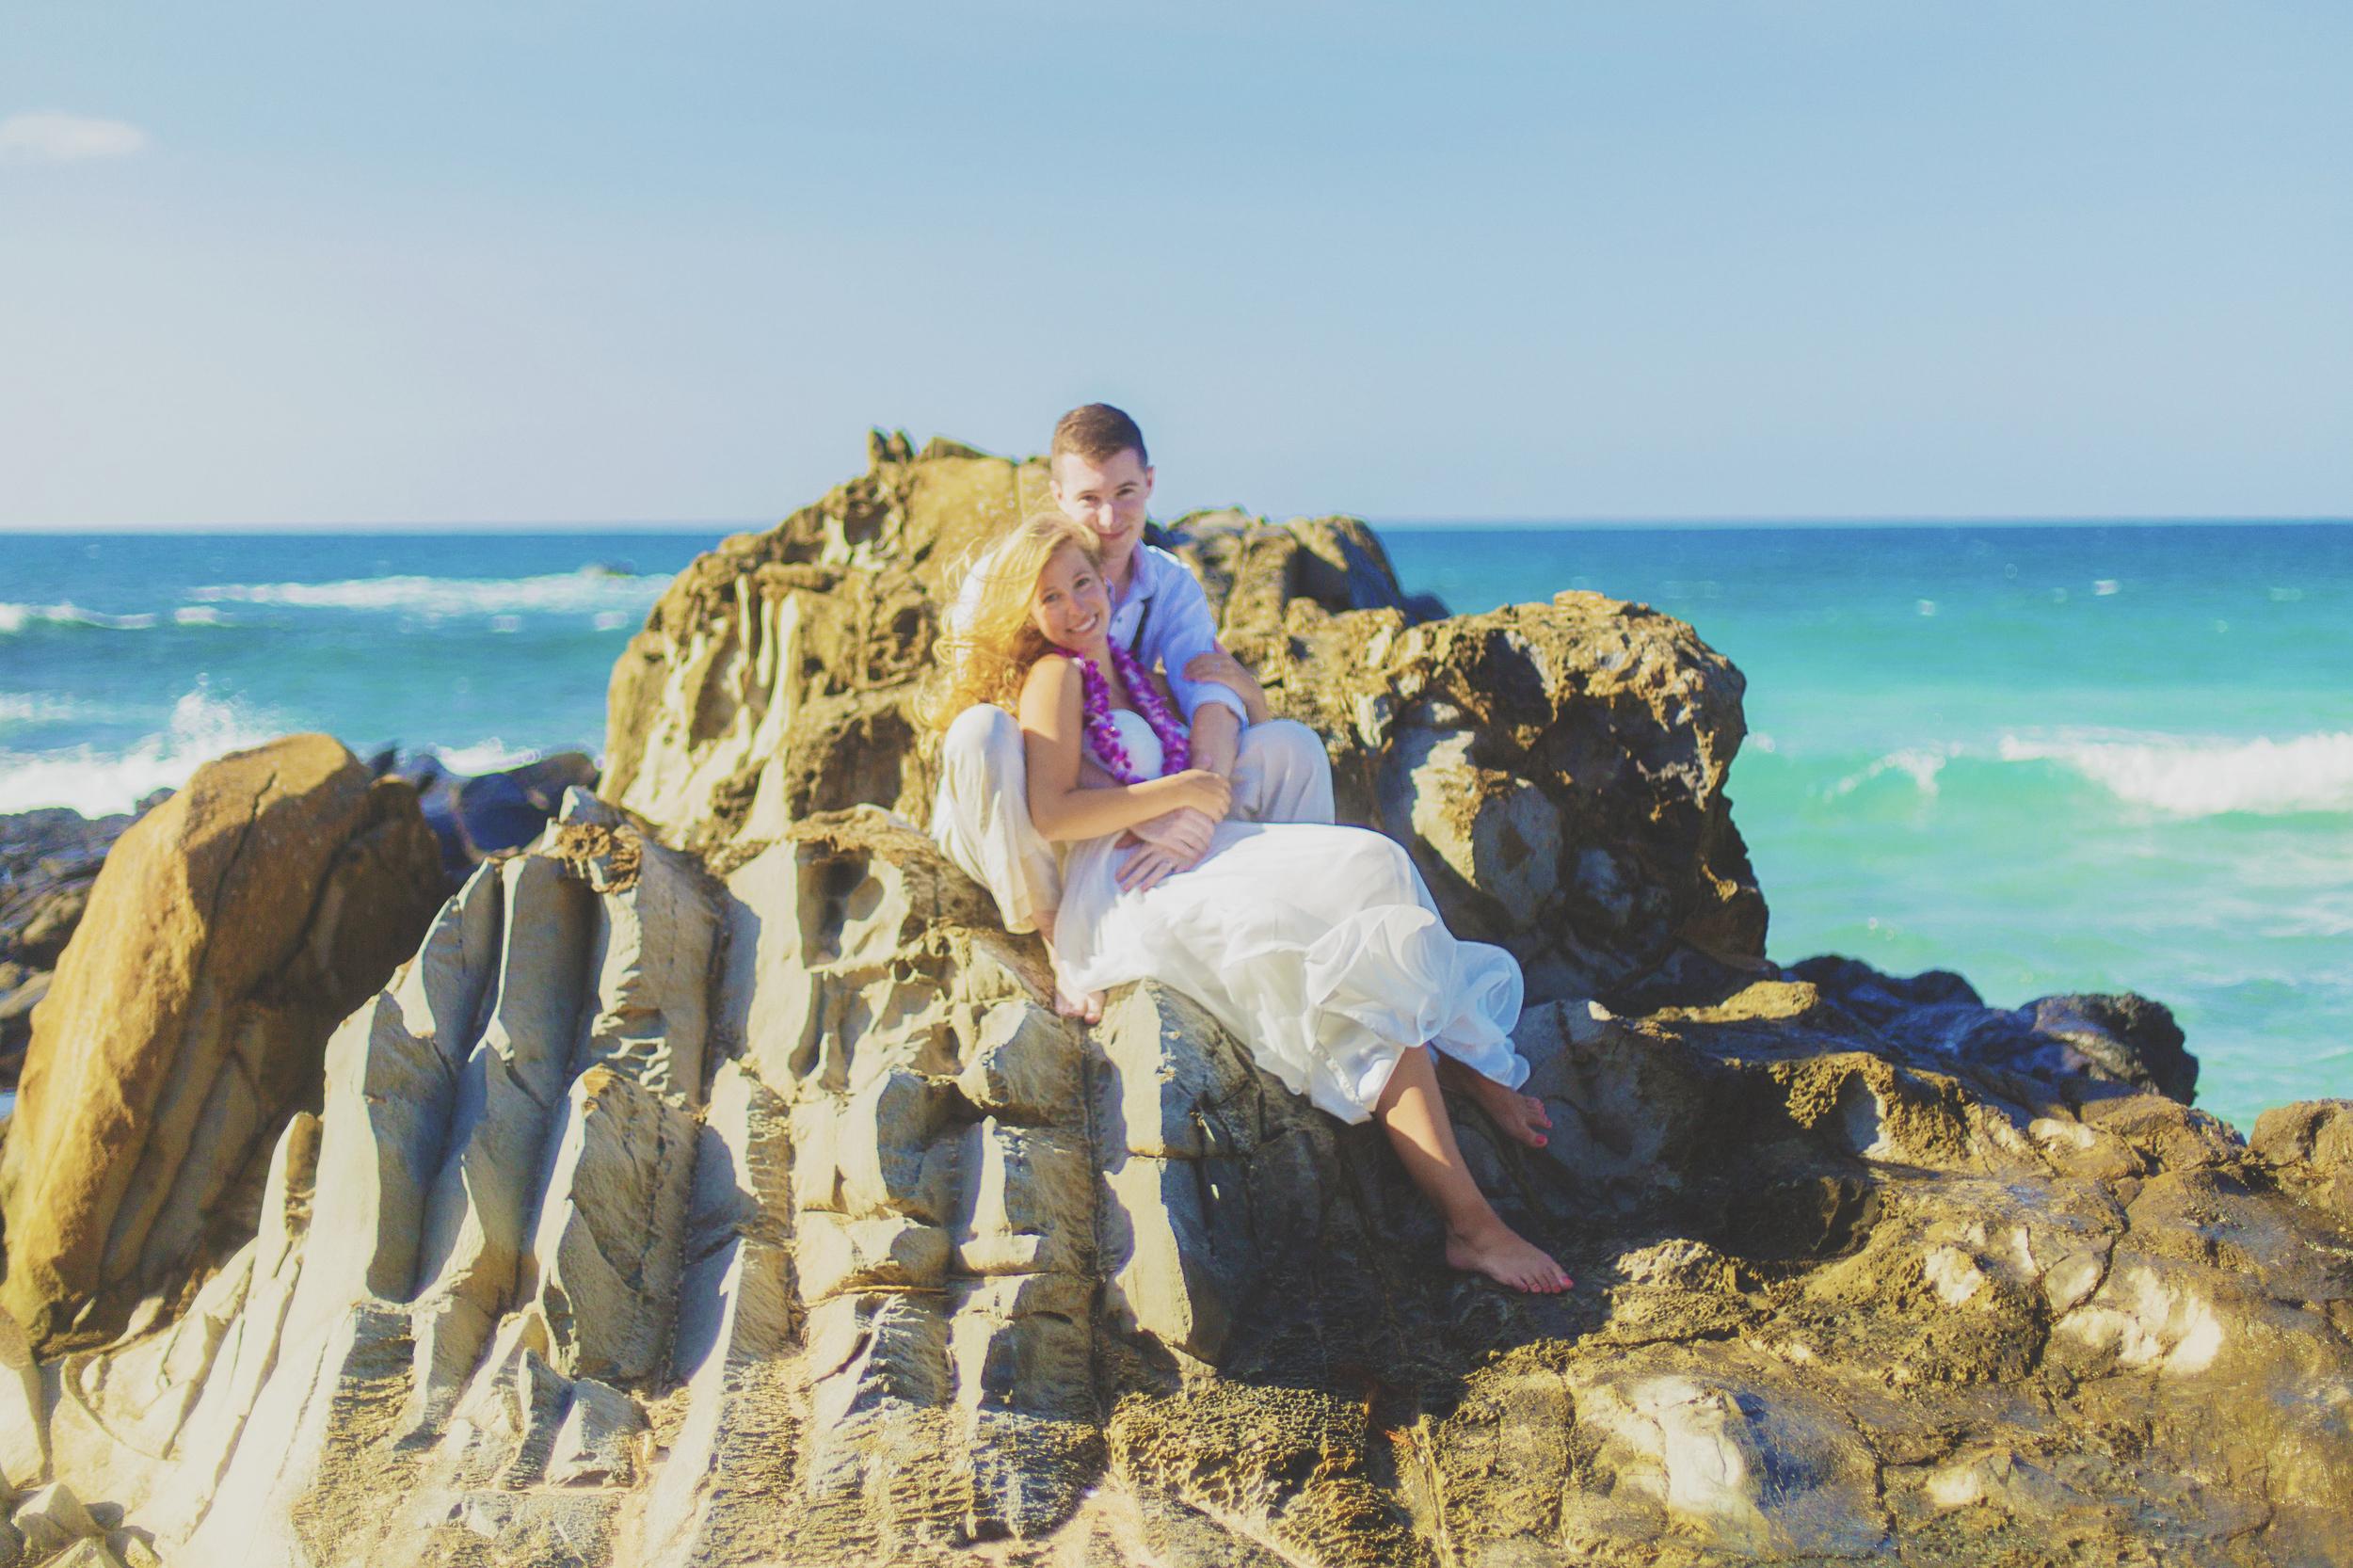 angie-diaz-photography-maui-honeymoon-hawaii-elopement-16.jpg